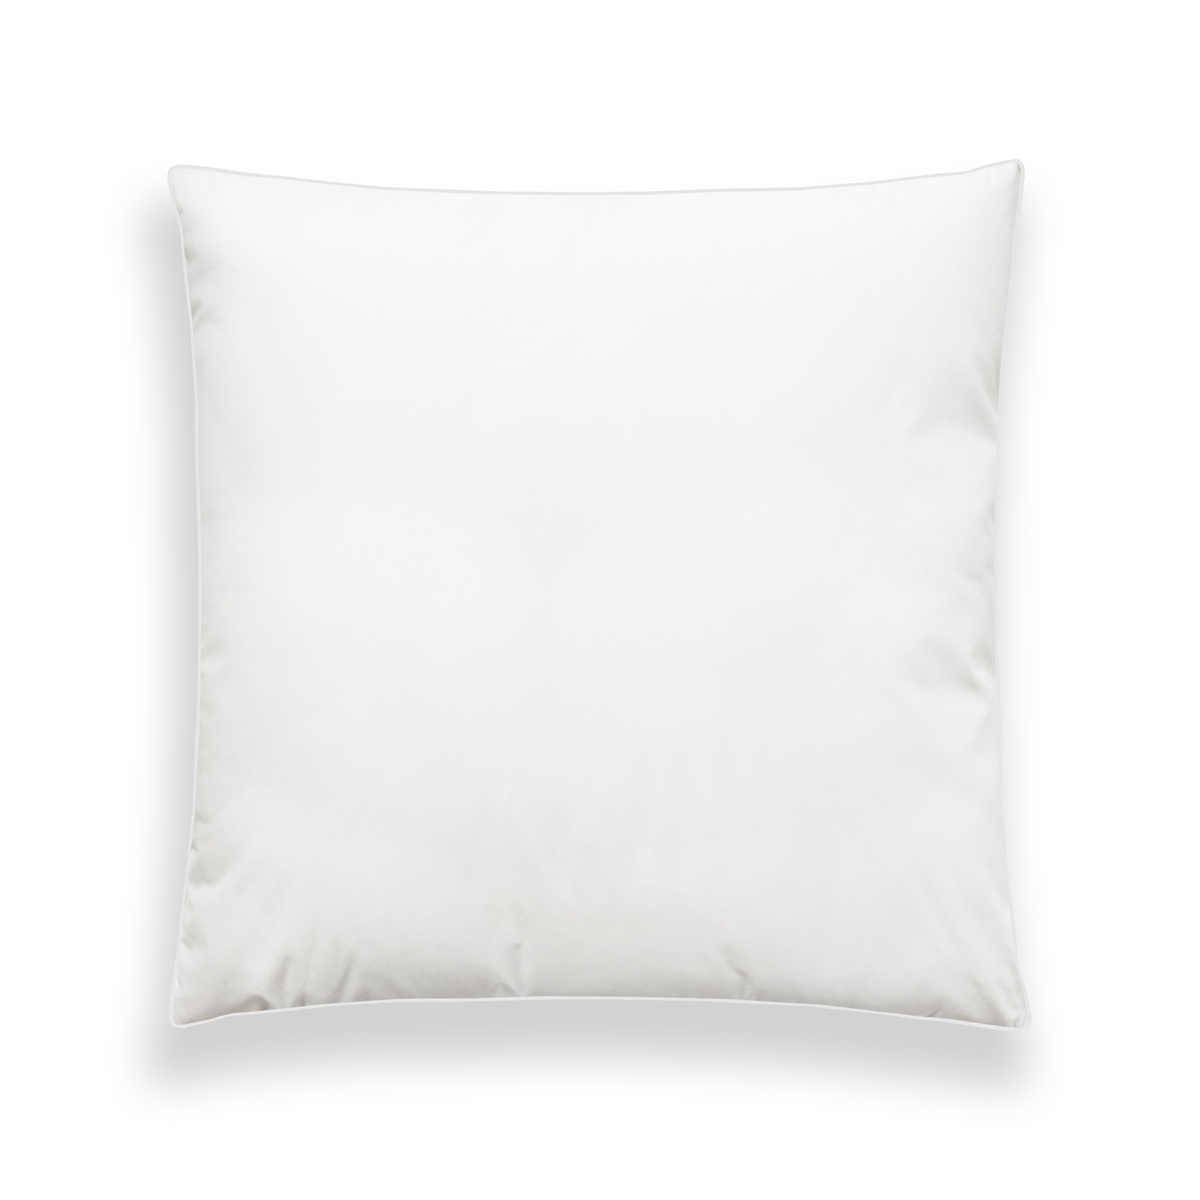 Oreiller FERME 10% Duvet - Coton Bio  65x65 cm